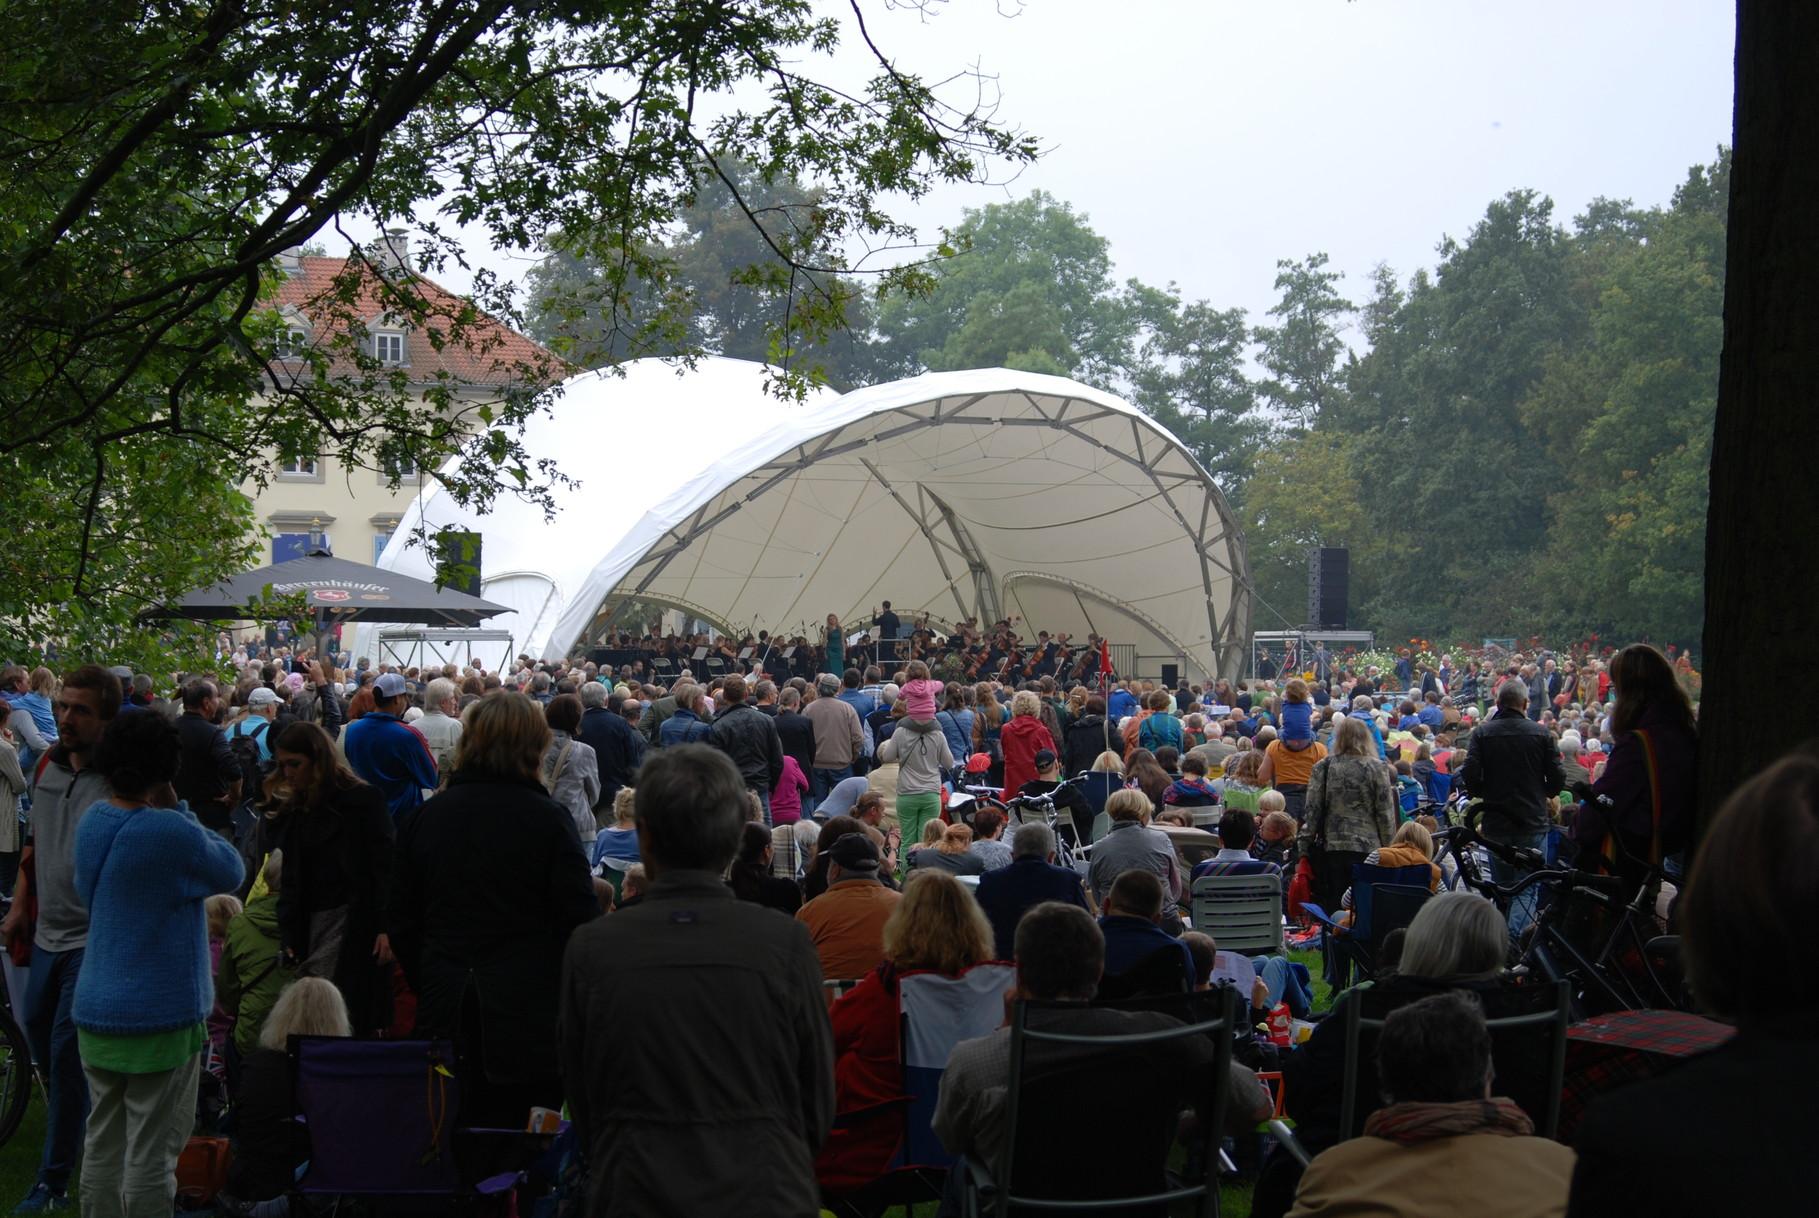 Orchester Open Air, Klassik Open Air, Georgengarten Hannover vor Wilhelm Busch Museum